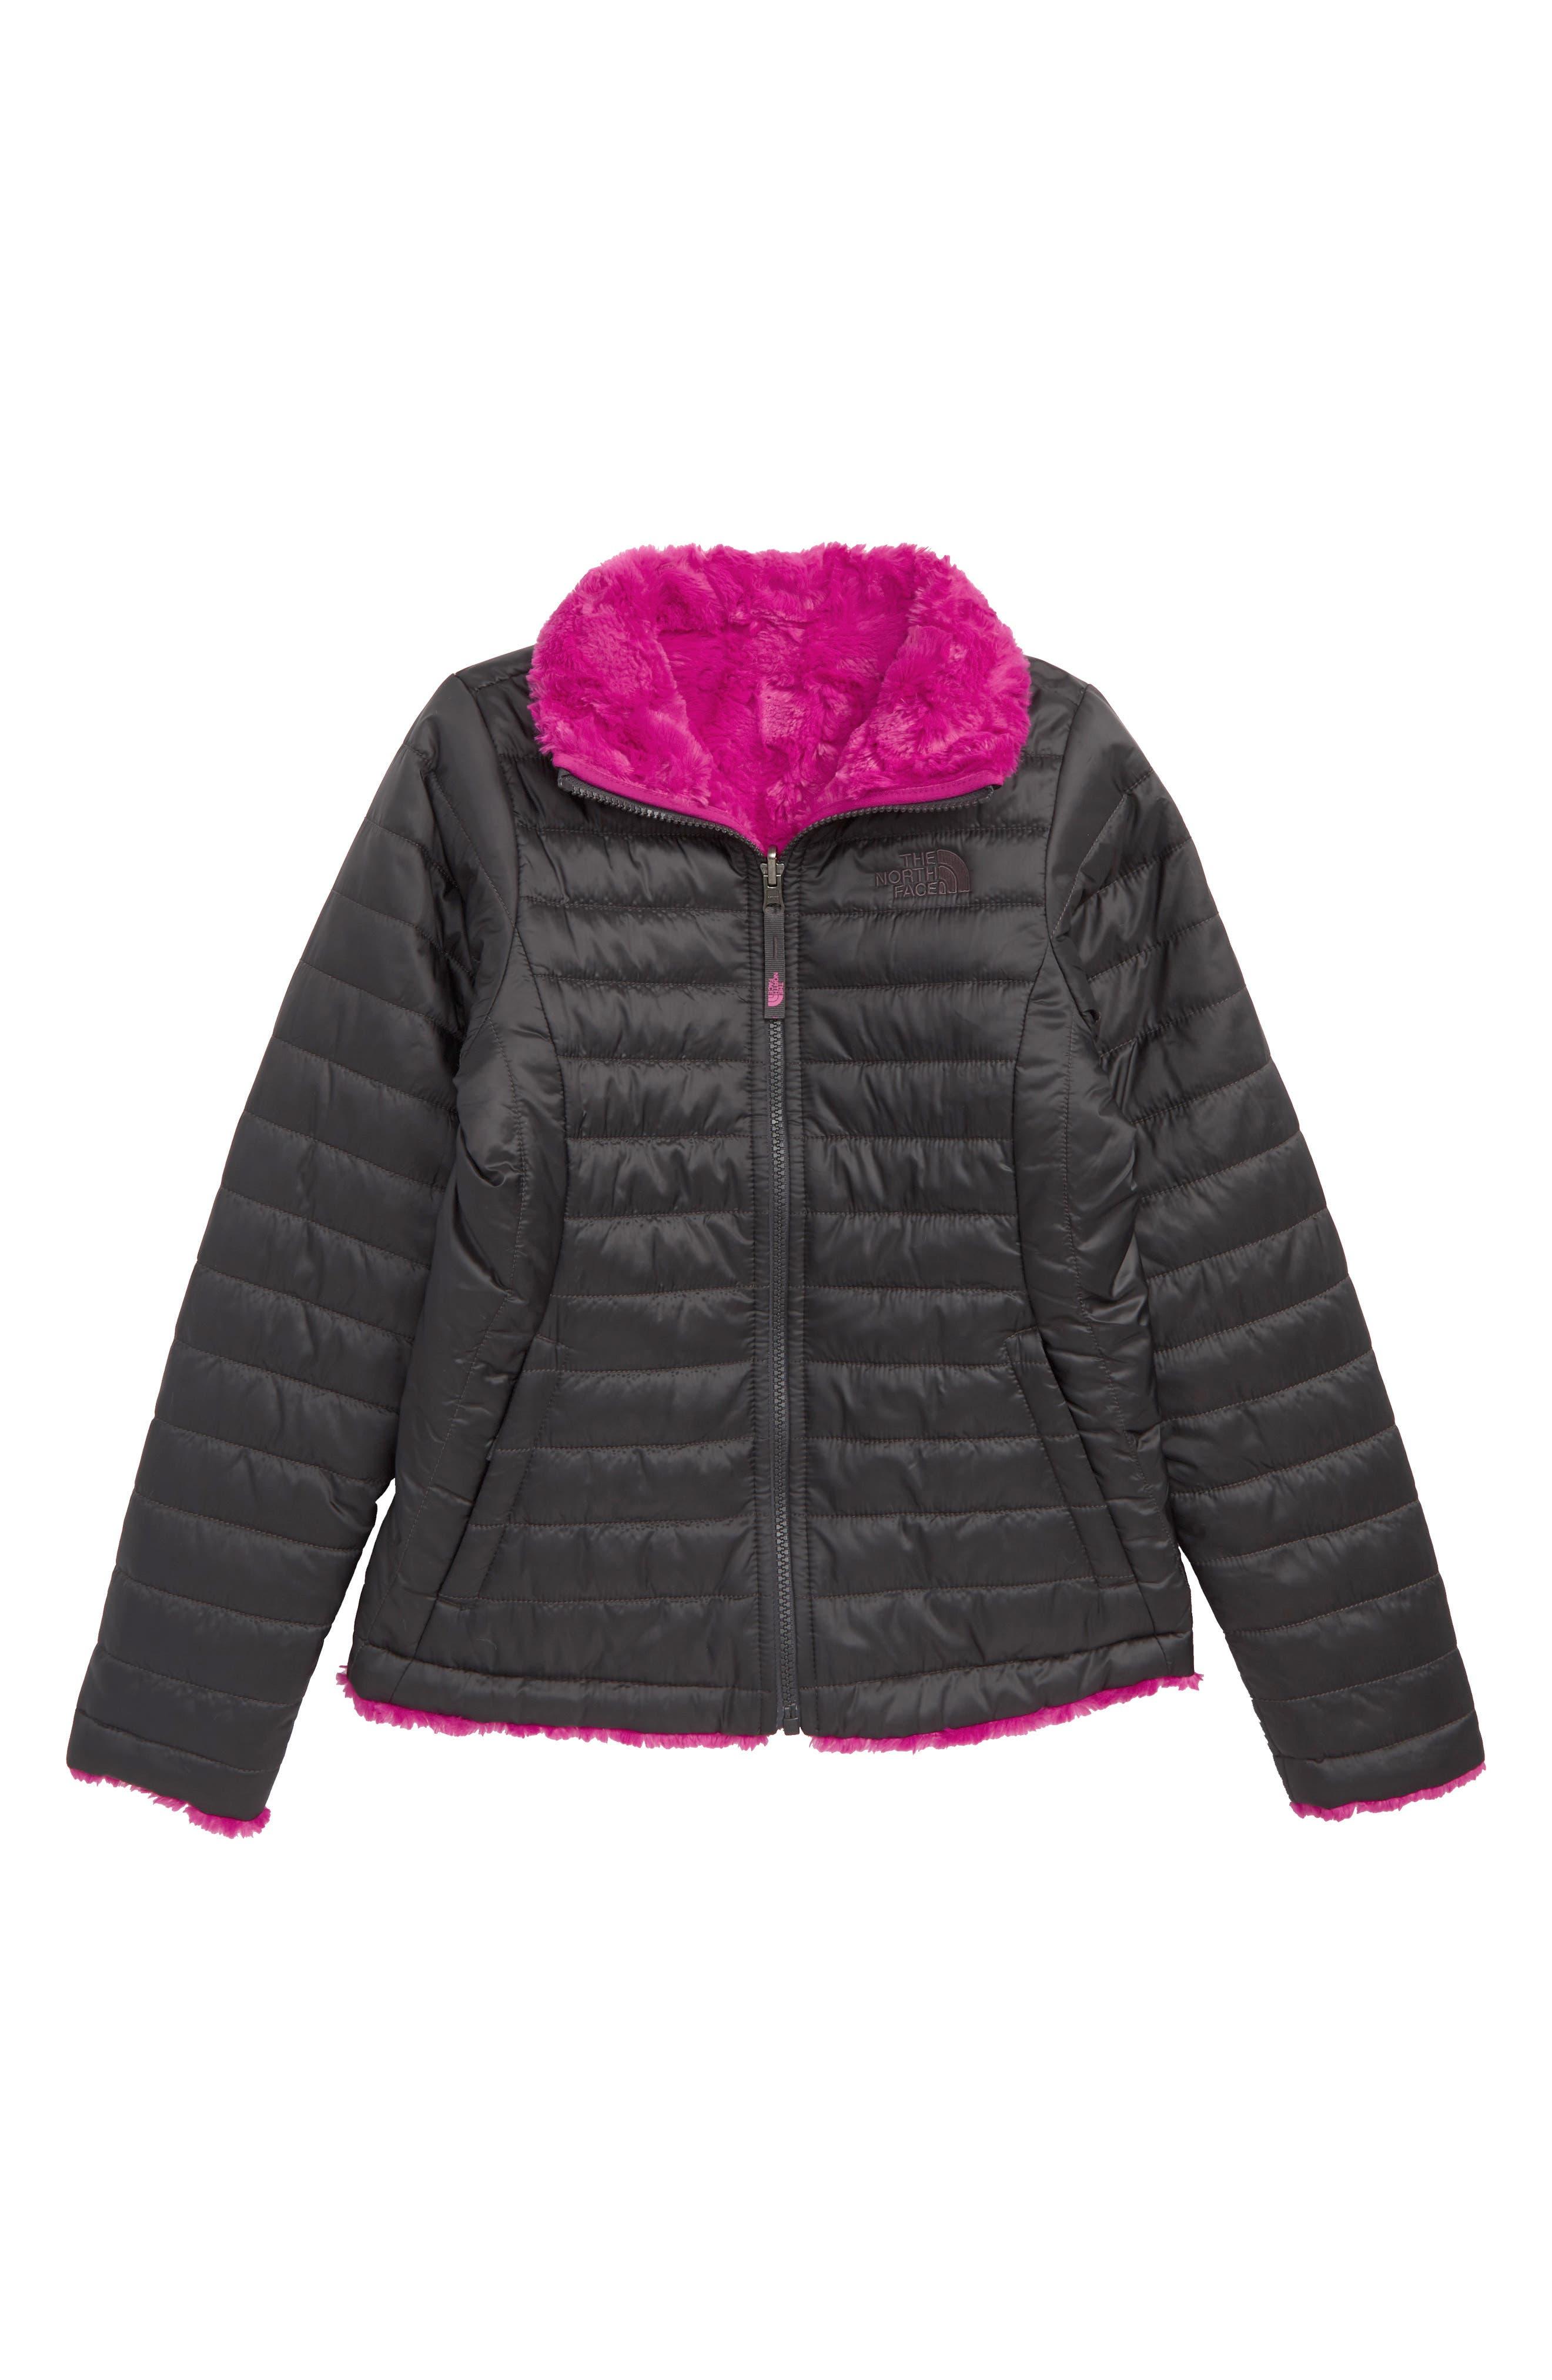 17e08788c Girls' Purple Coats, Jackets & Outerwear: Rain, Fleece & Hood ...